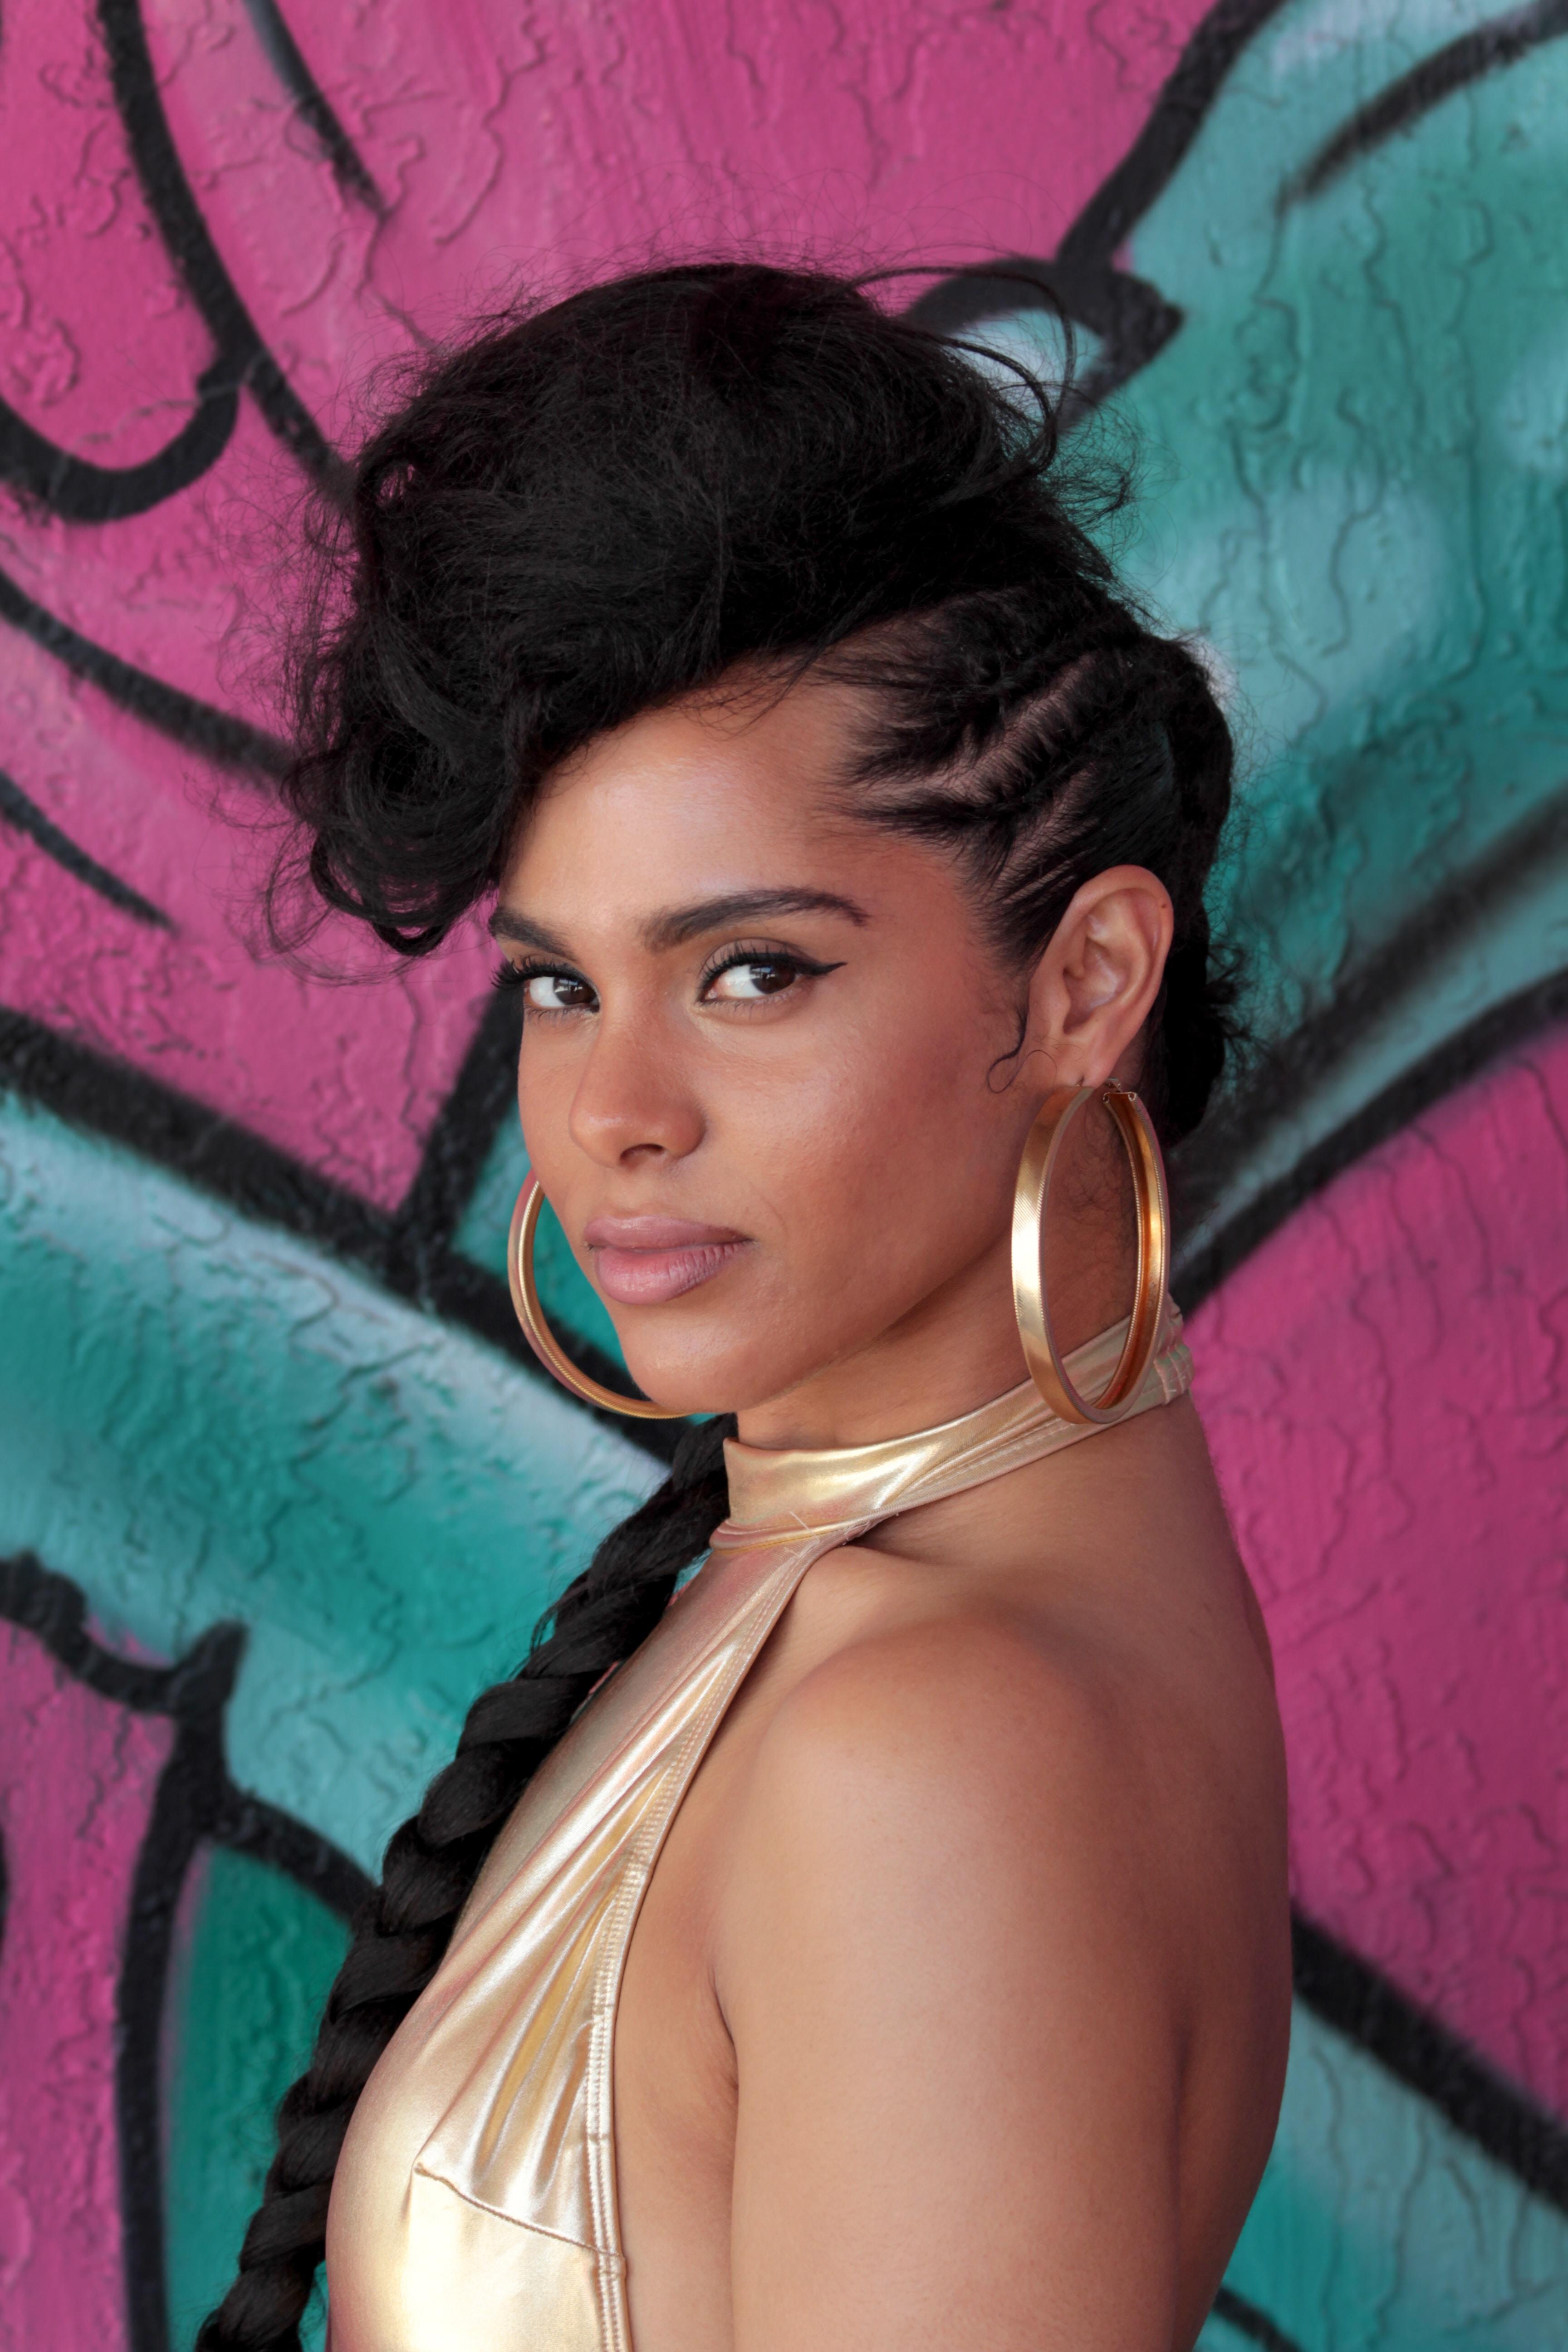 Alicia Keys standing near wall with graffiti art